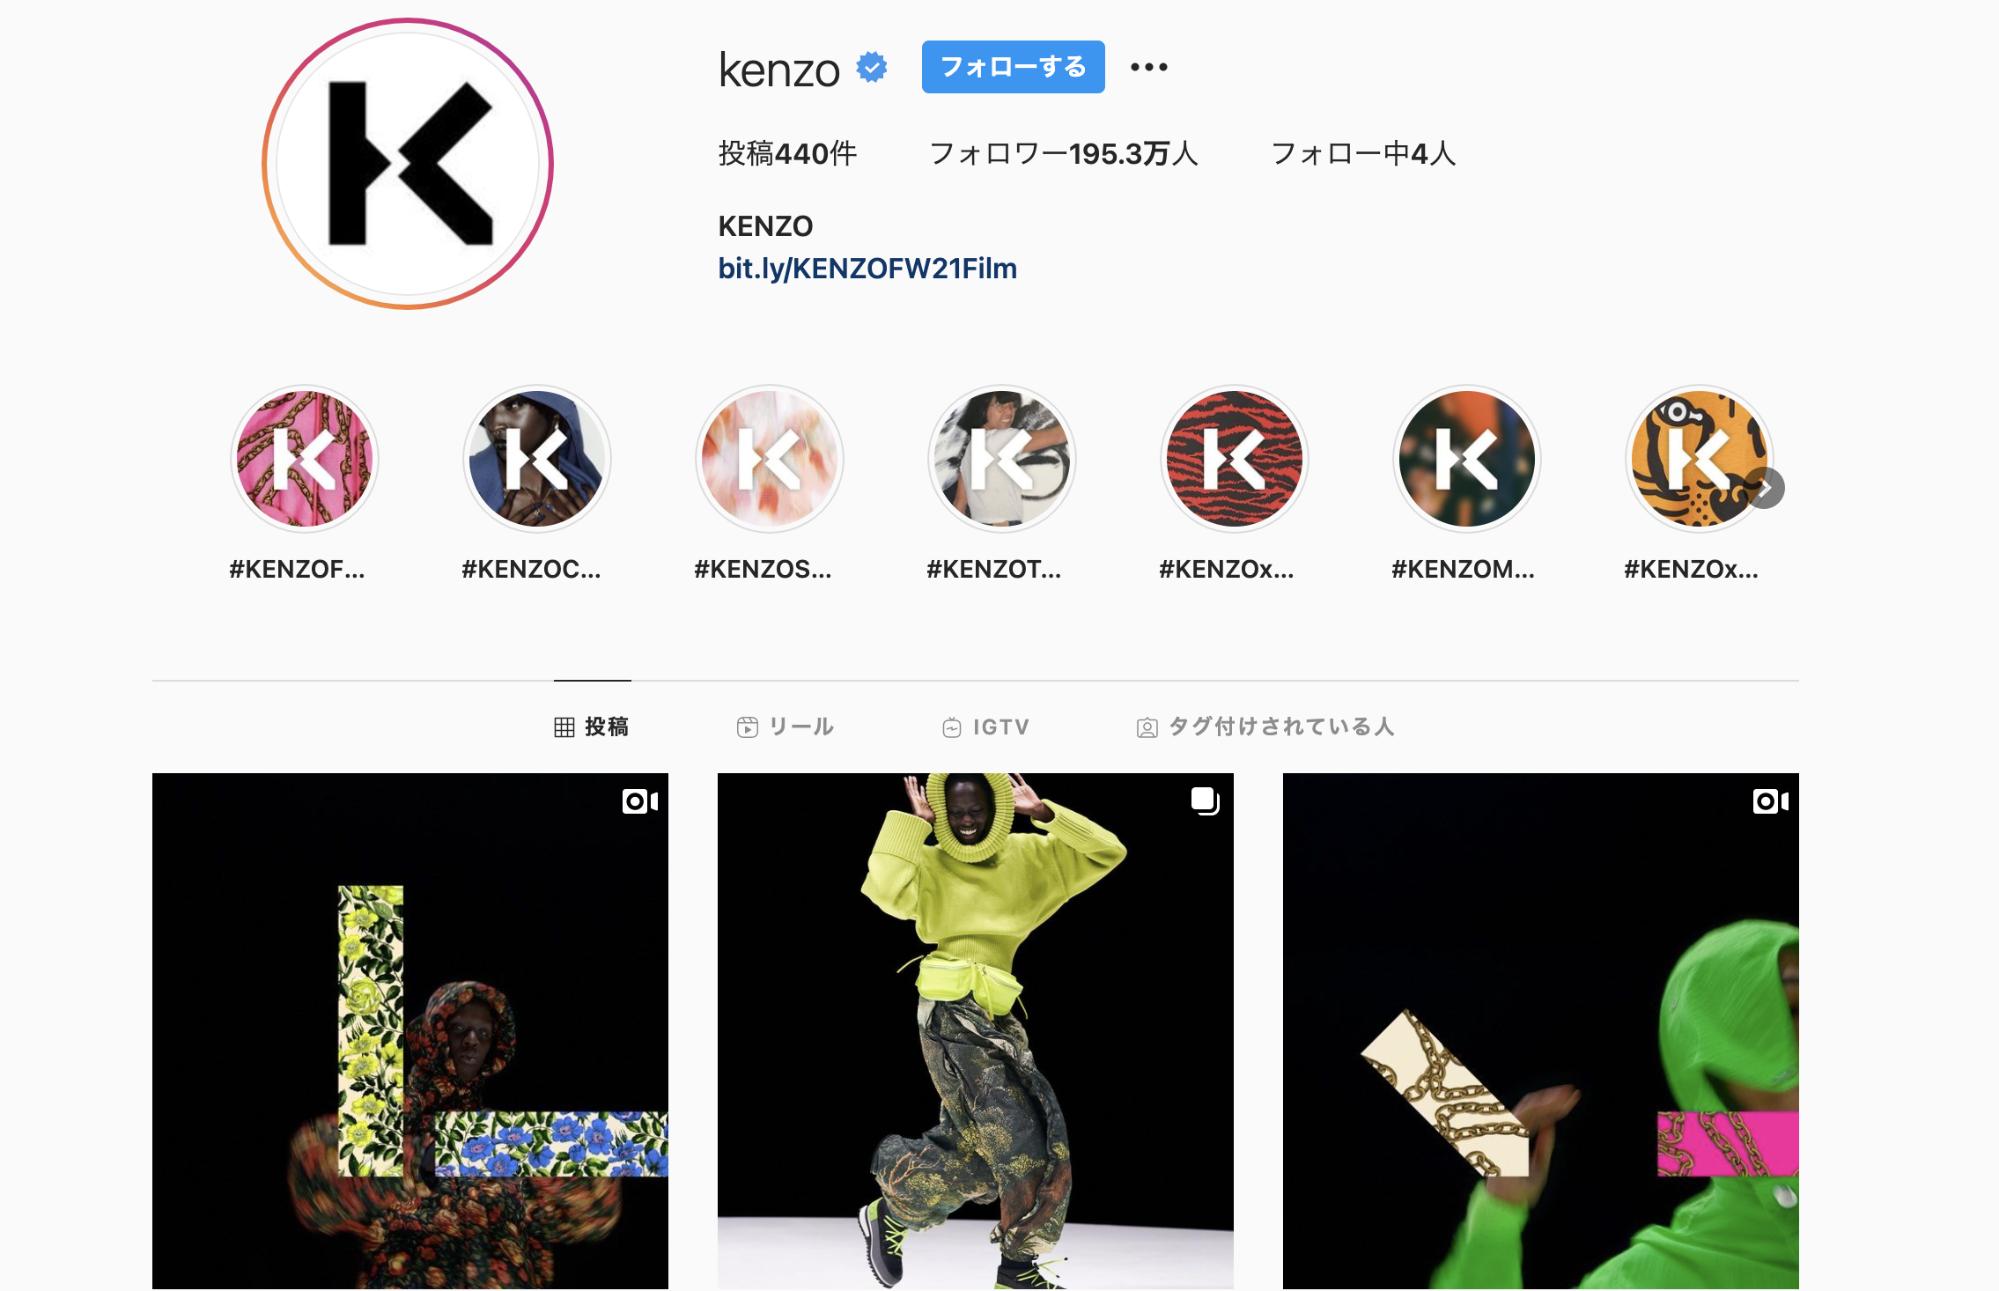 KENZO Instagram